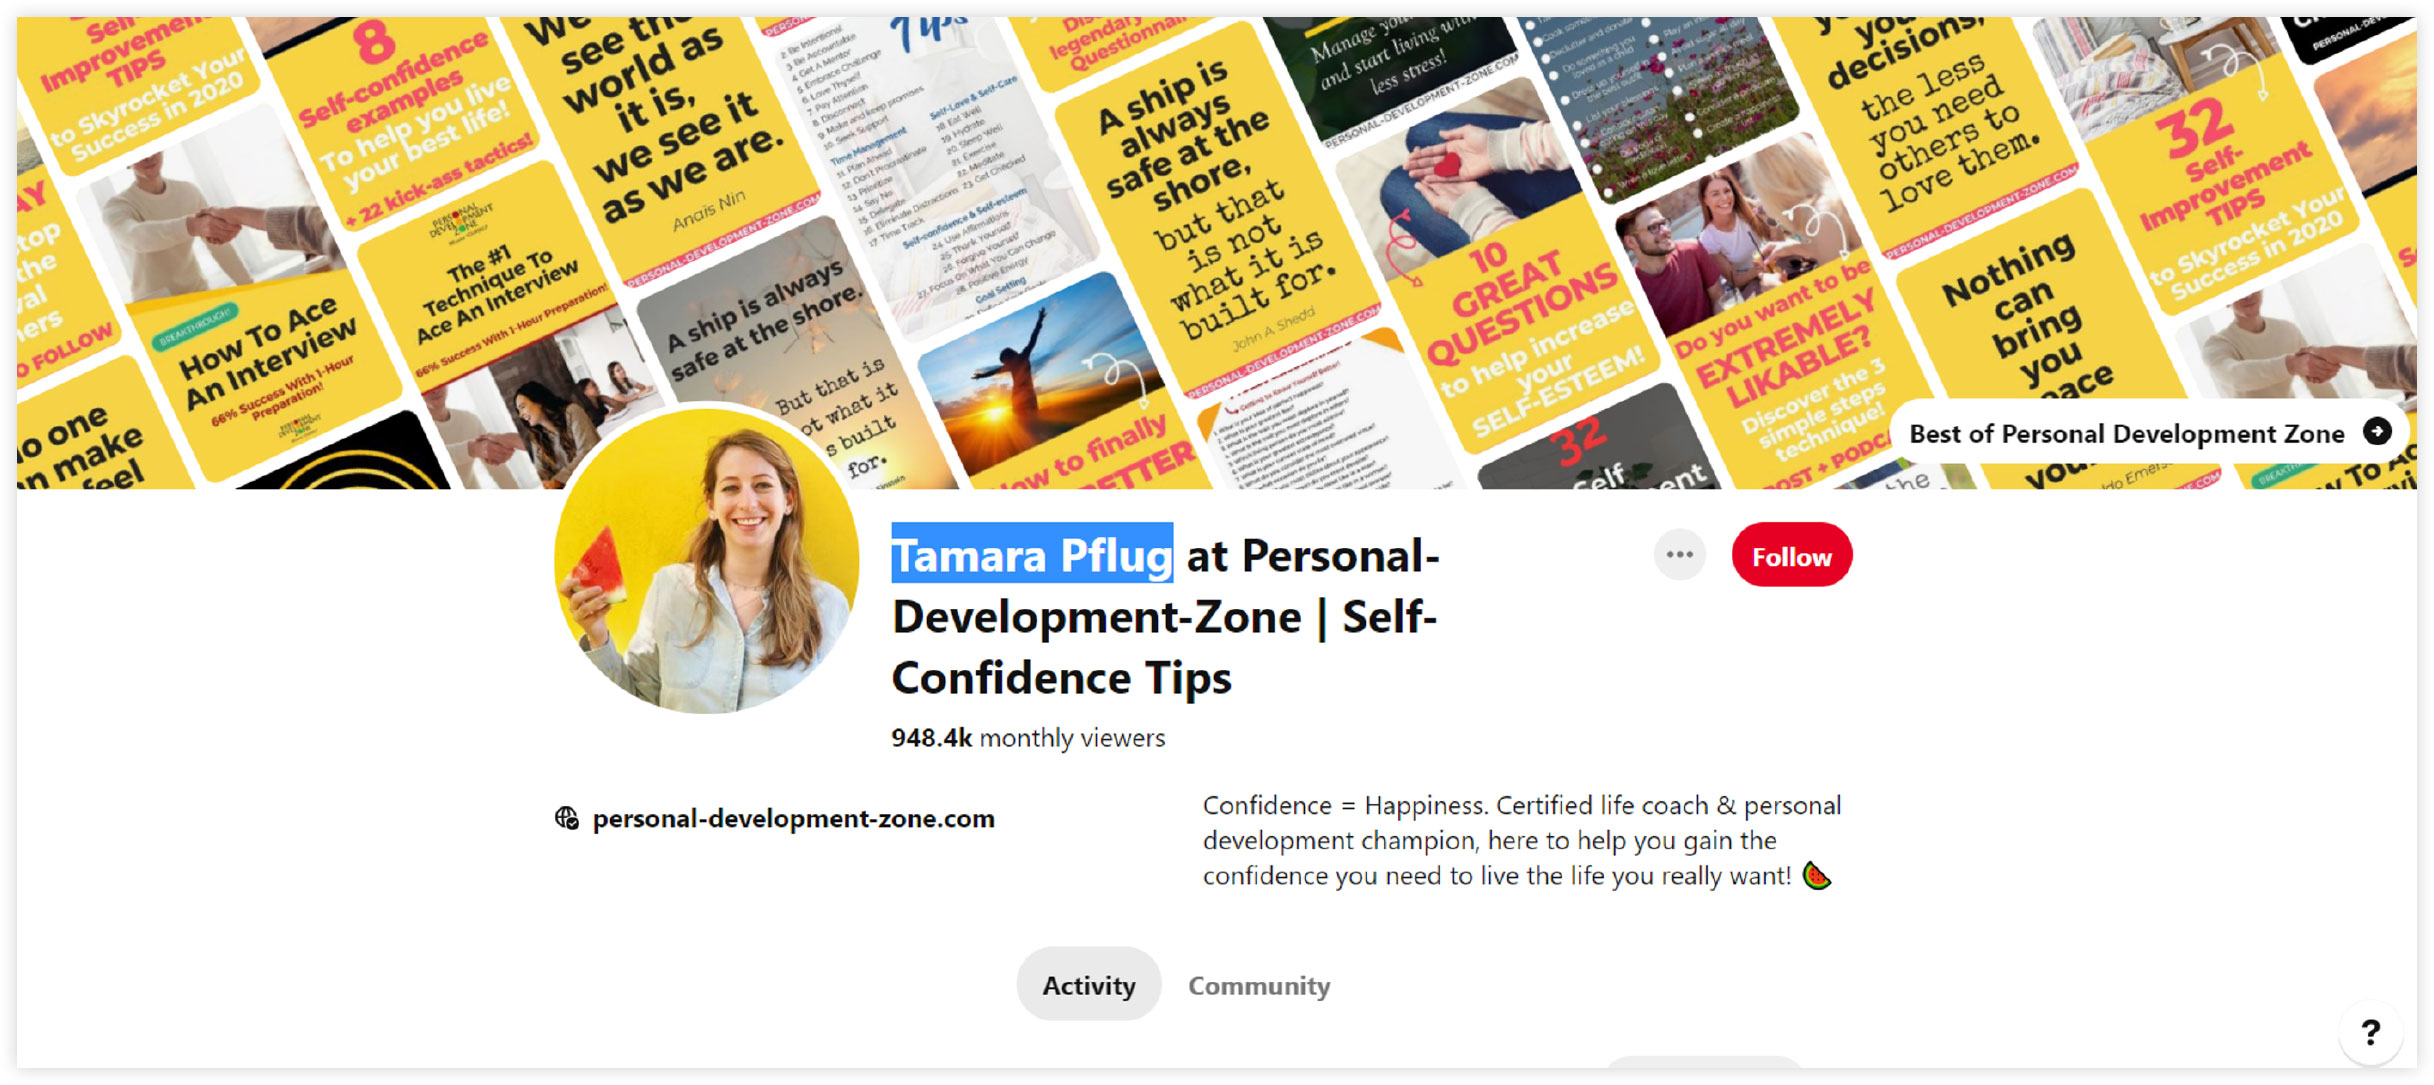 tamara pflugs pinterest profile page